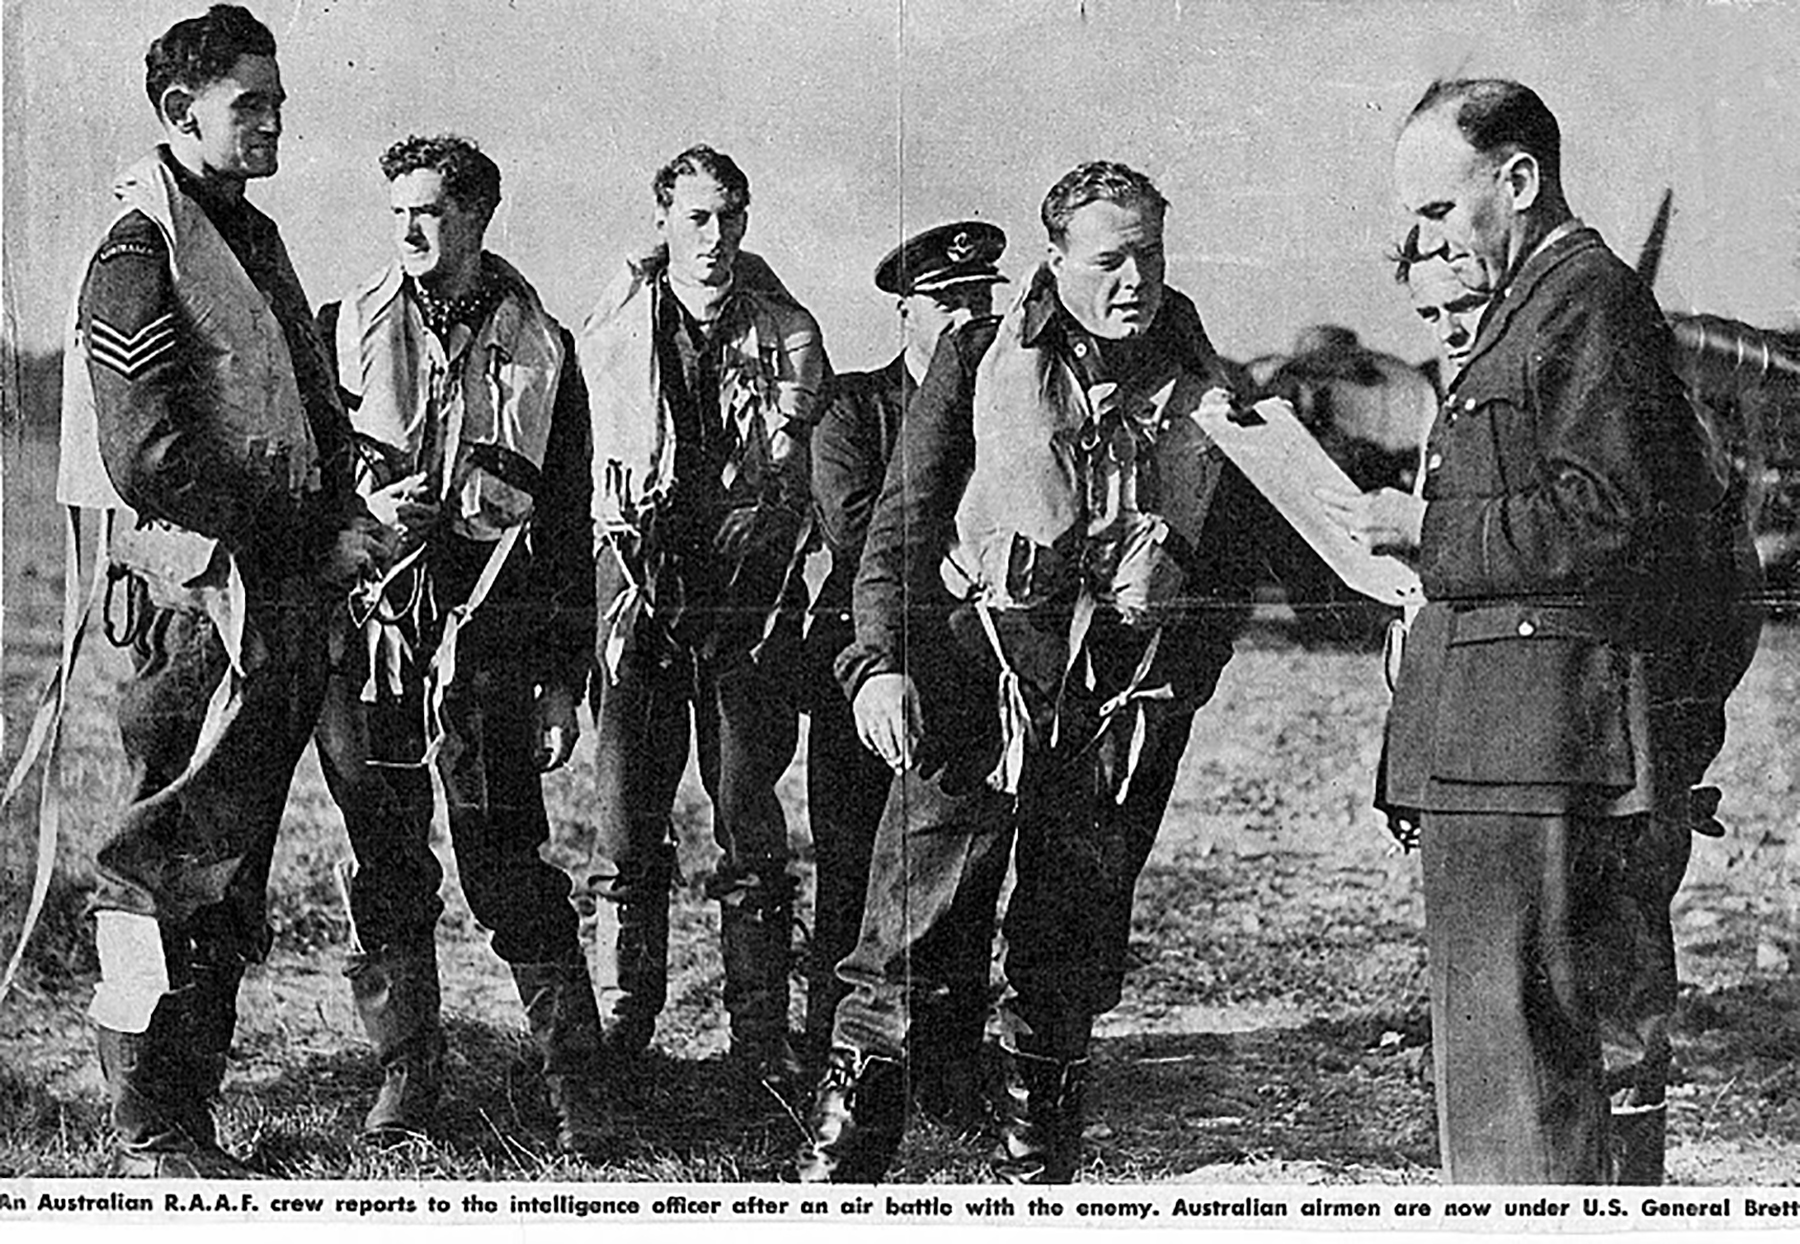 UK service Aircrew RAAF 452 Squadron pilots and IO 01